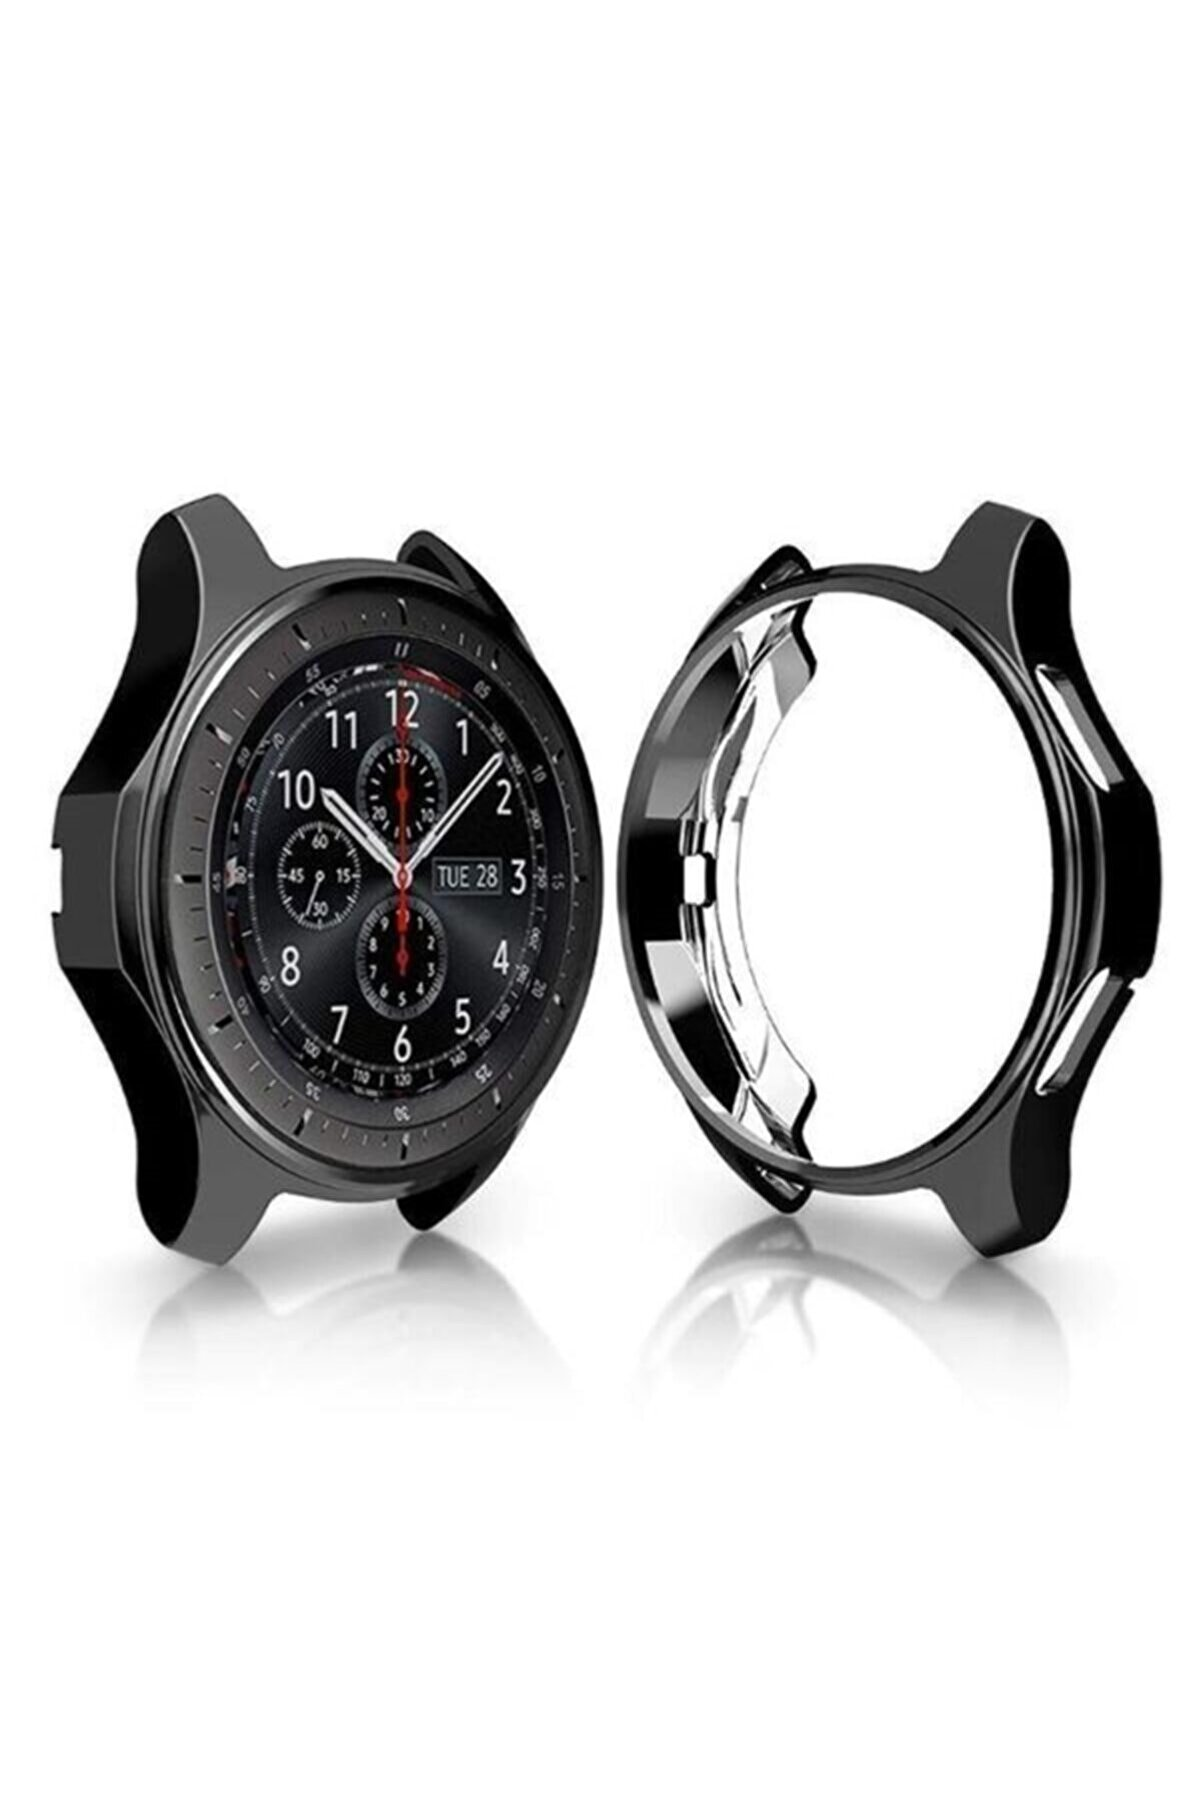 endijital Samsung Galaxy Watch 3 45mm Bumper Koruyucu Silikon Kılıf